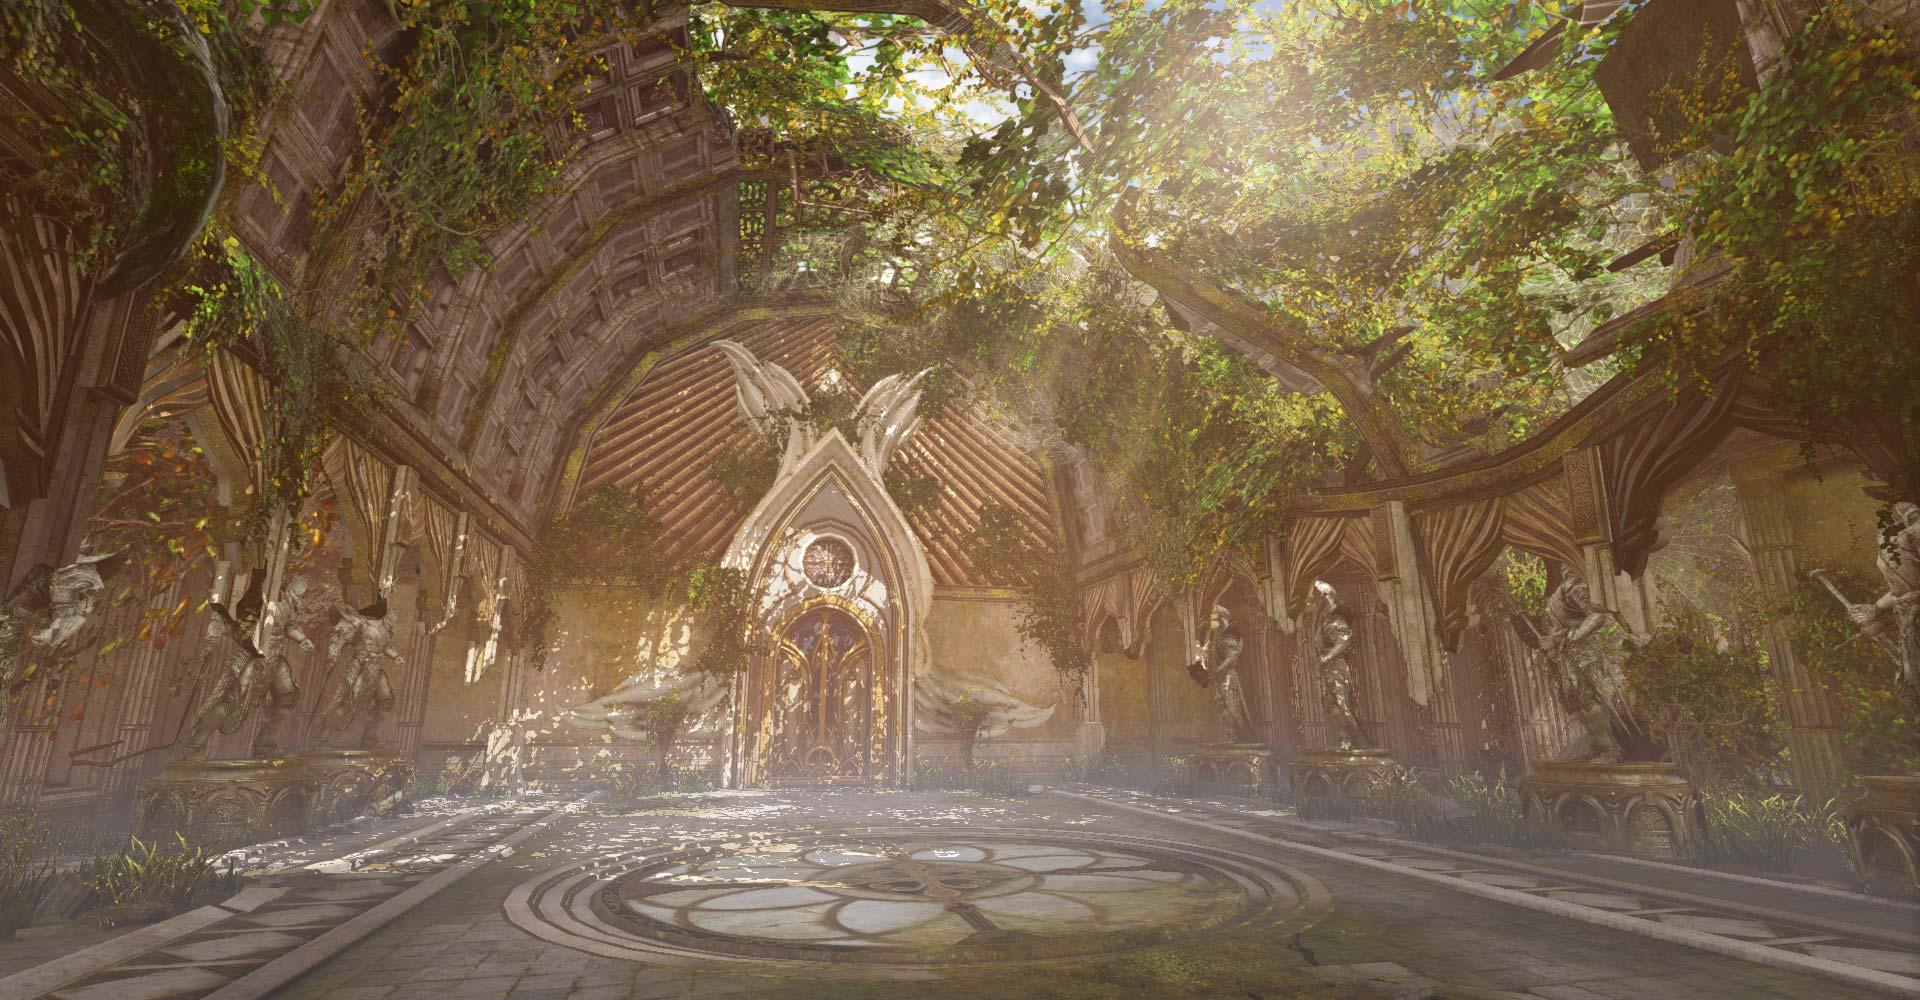 Ipnysh Sanctuary